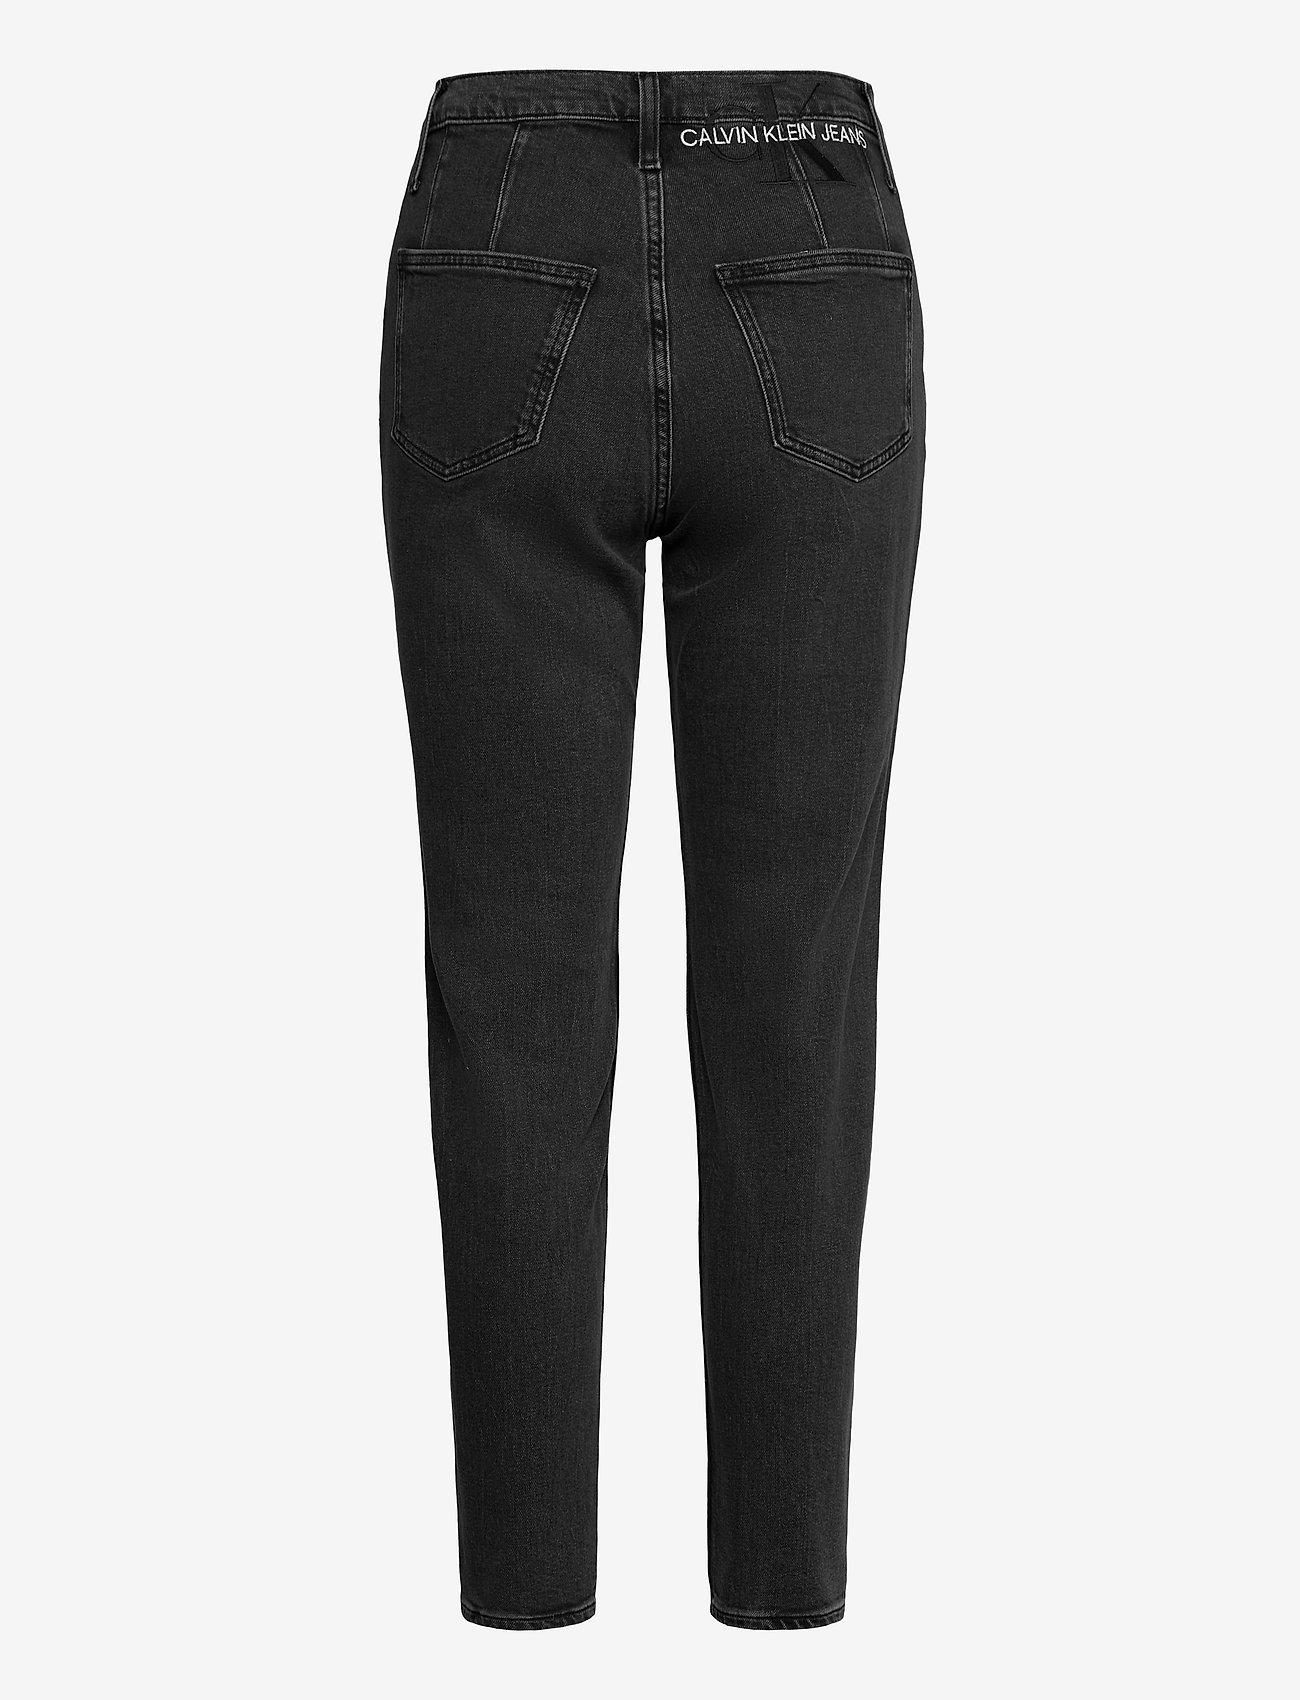 Calvin Klein Jeans - MOM JEAN - mammajeans - denim black - 1